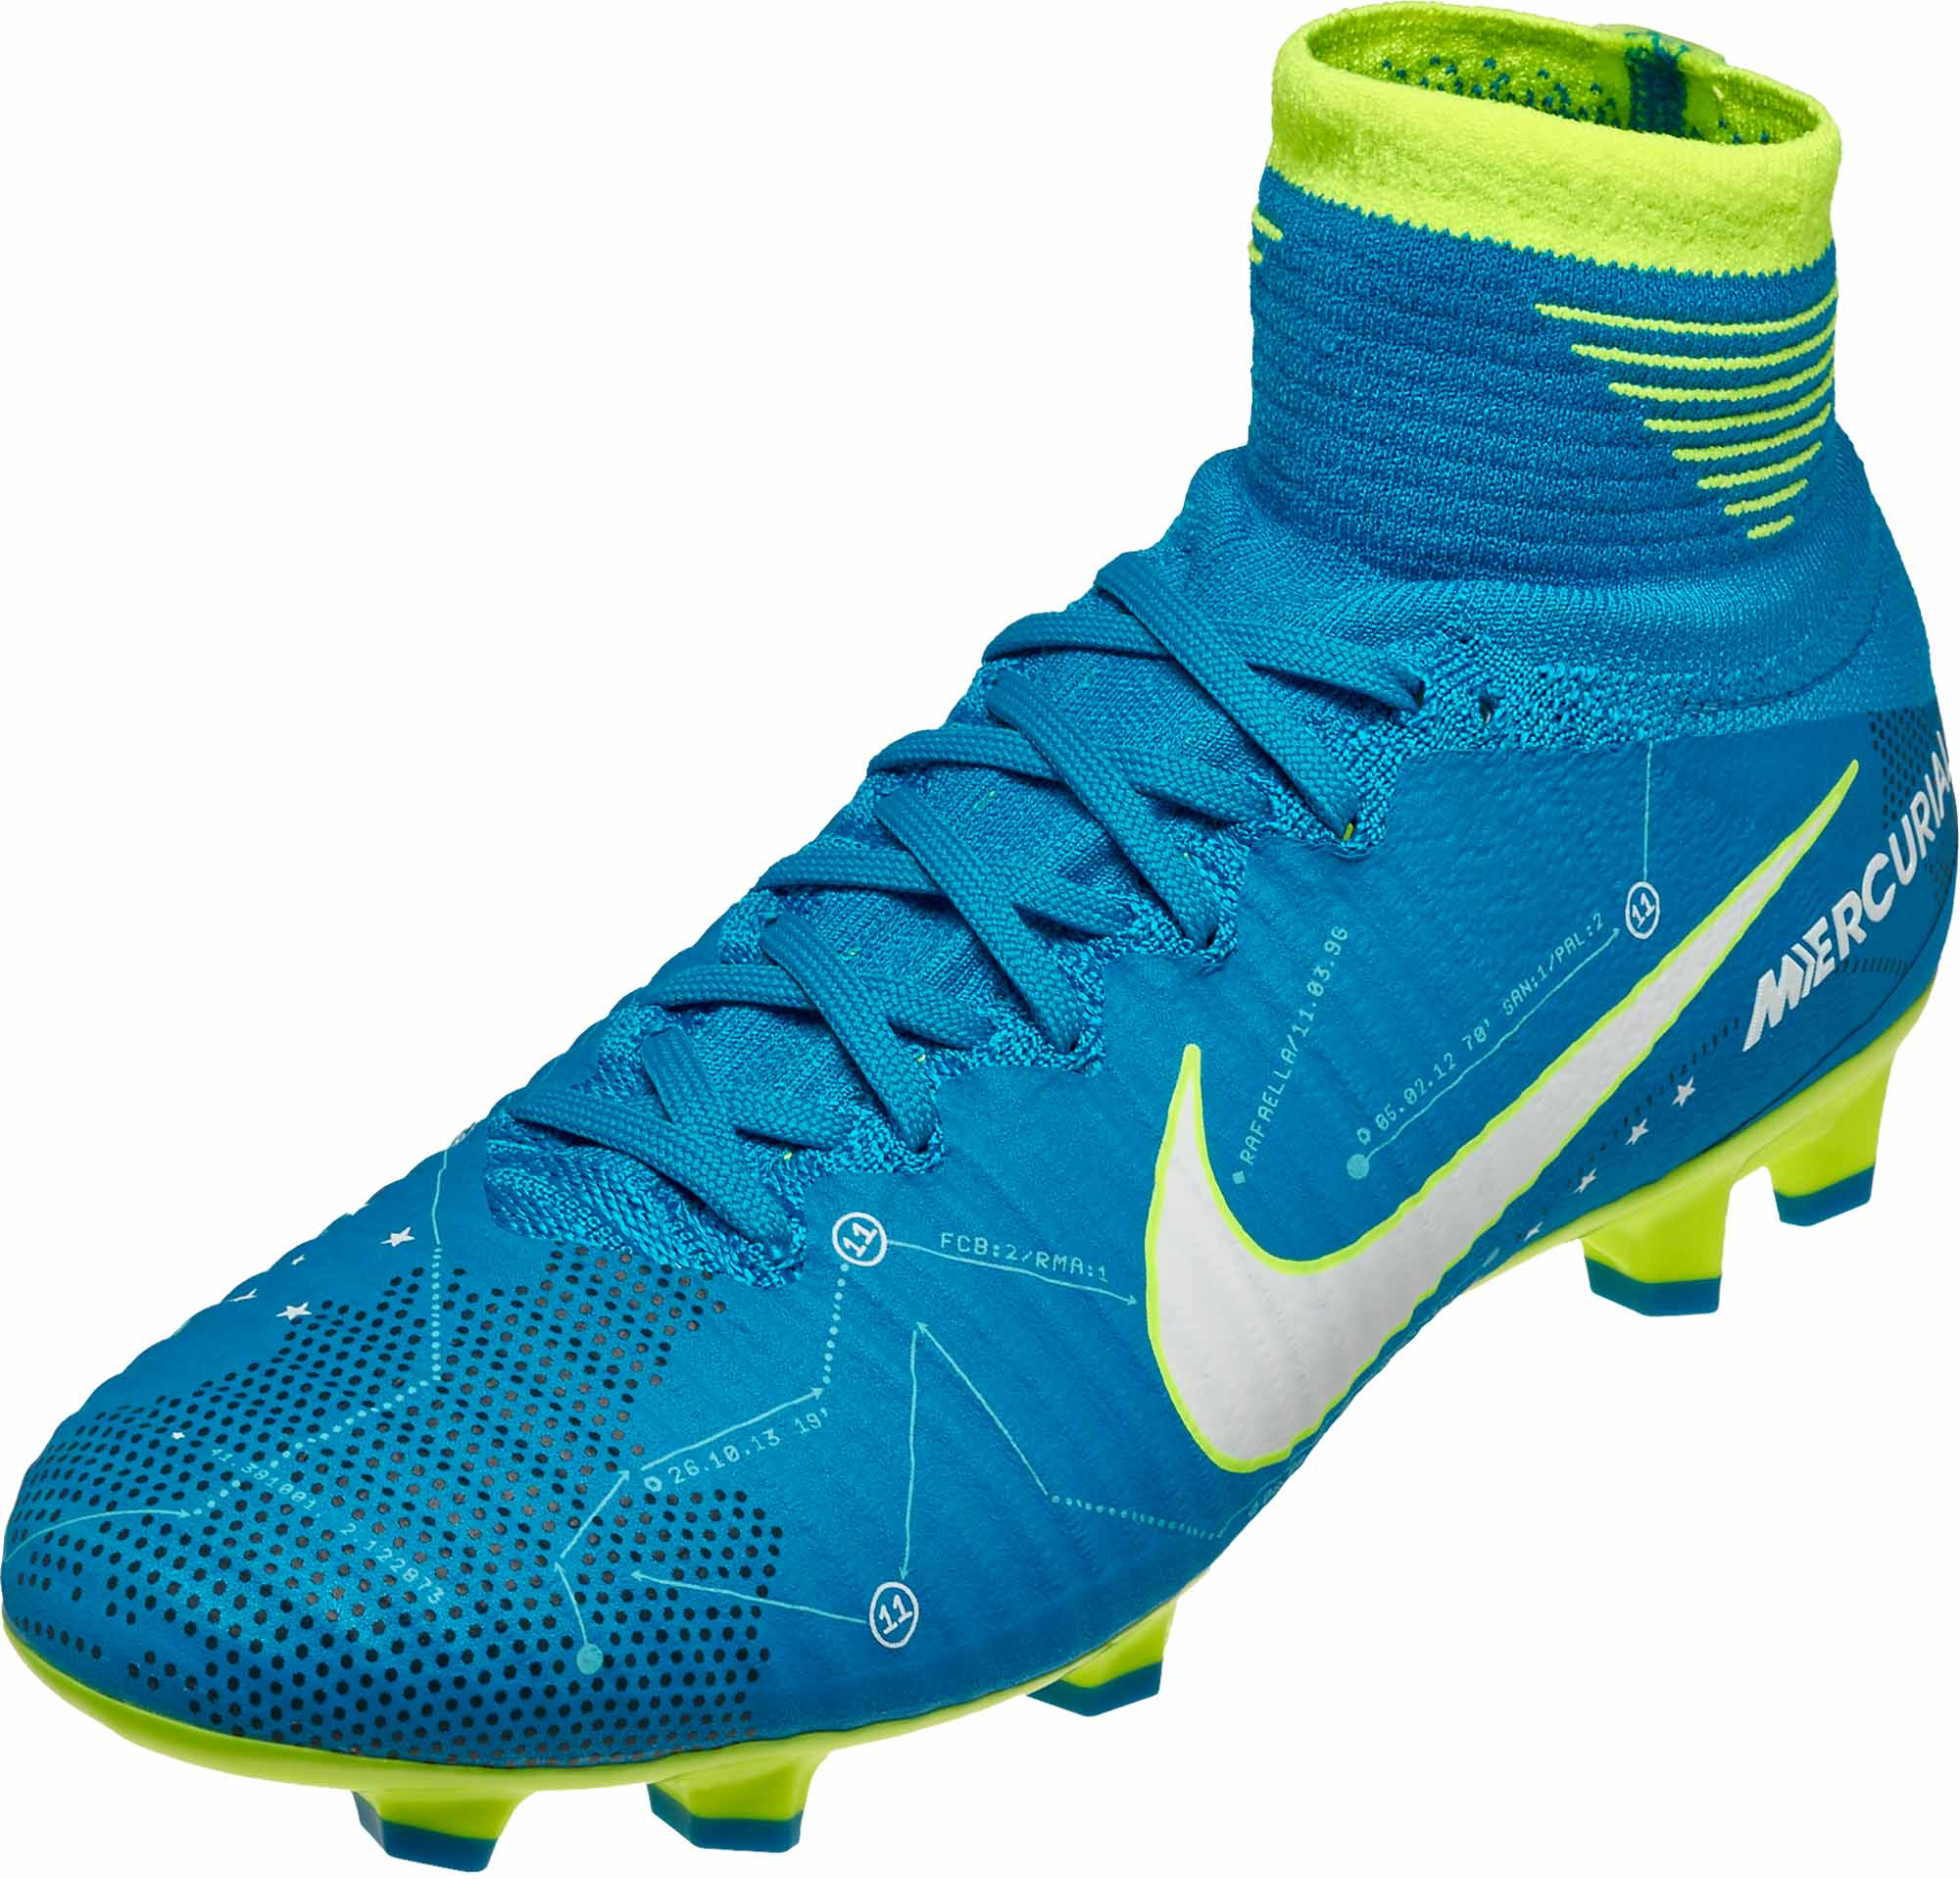 best sneakers 9fc22 07be8 Nike Kids Mercurial Superfly V FG – Neymar – Blue Orbit   White